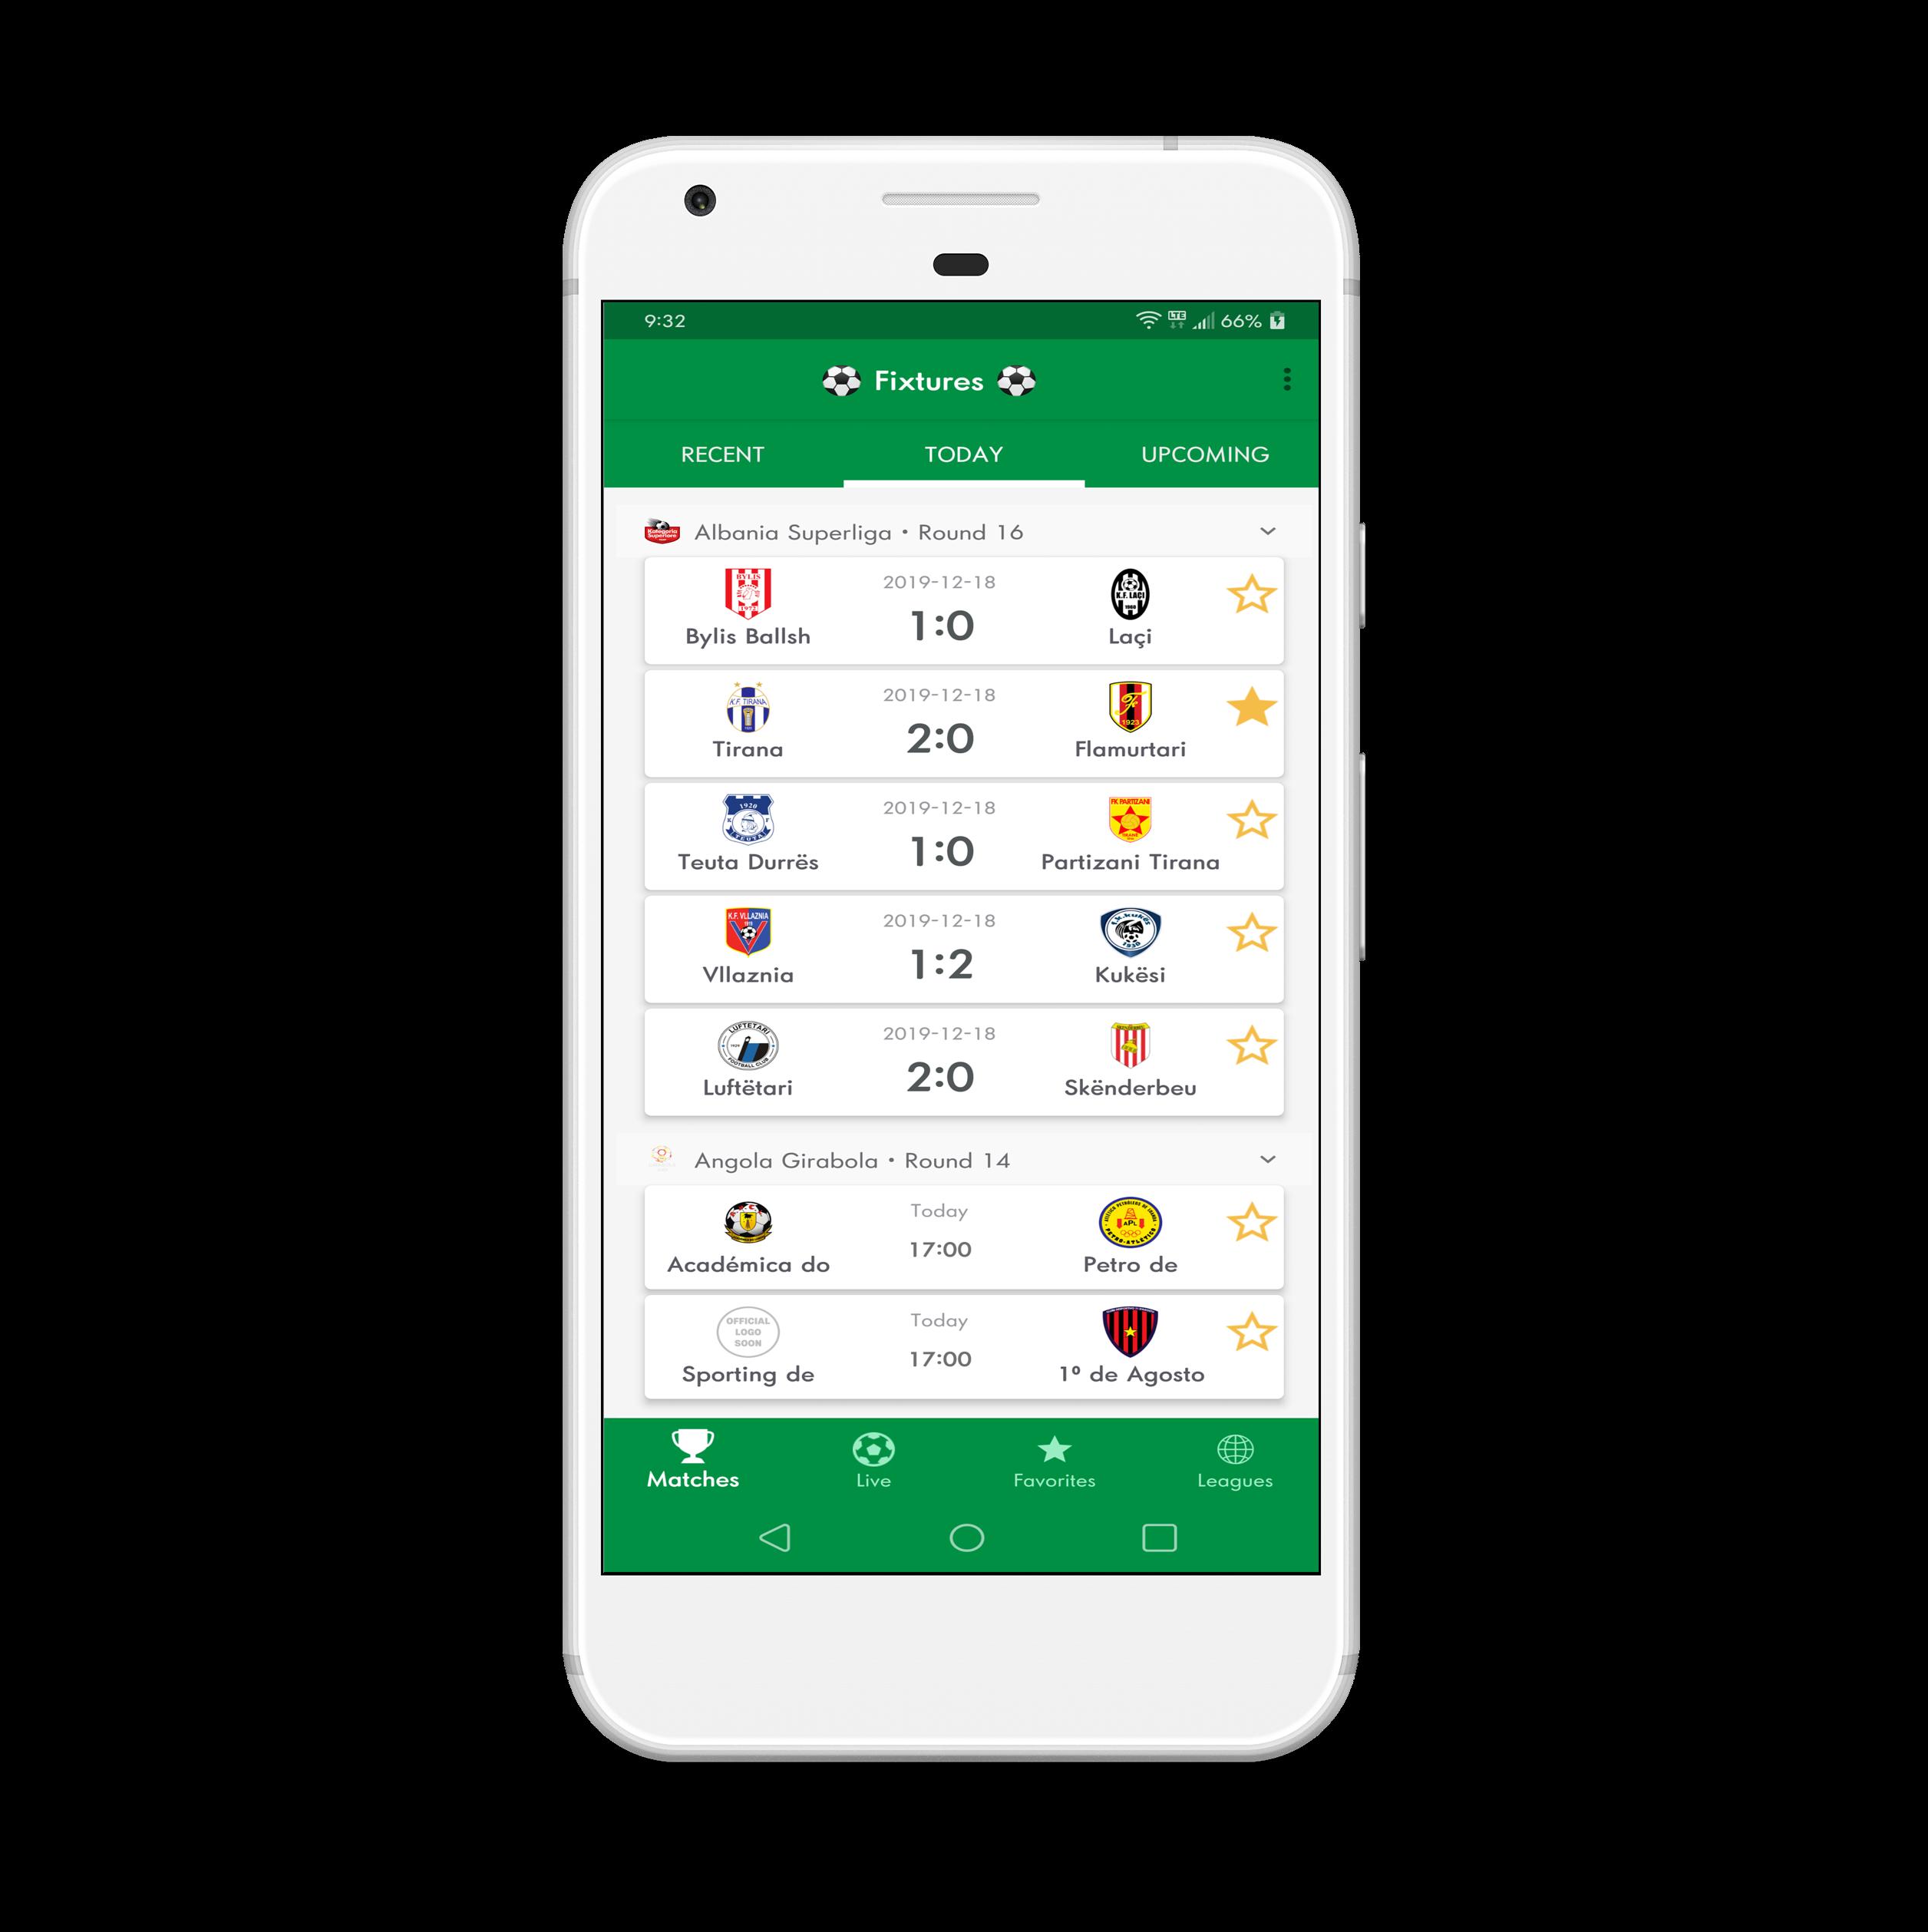 LiveScore - Football Android Full App (Admob) - 1